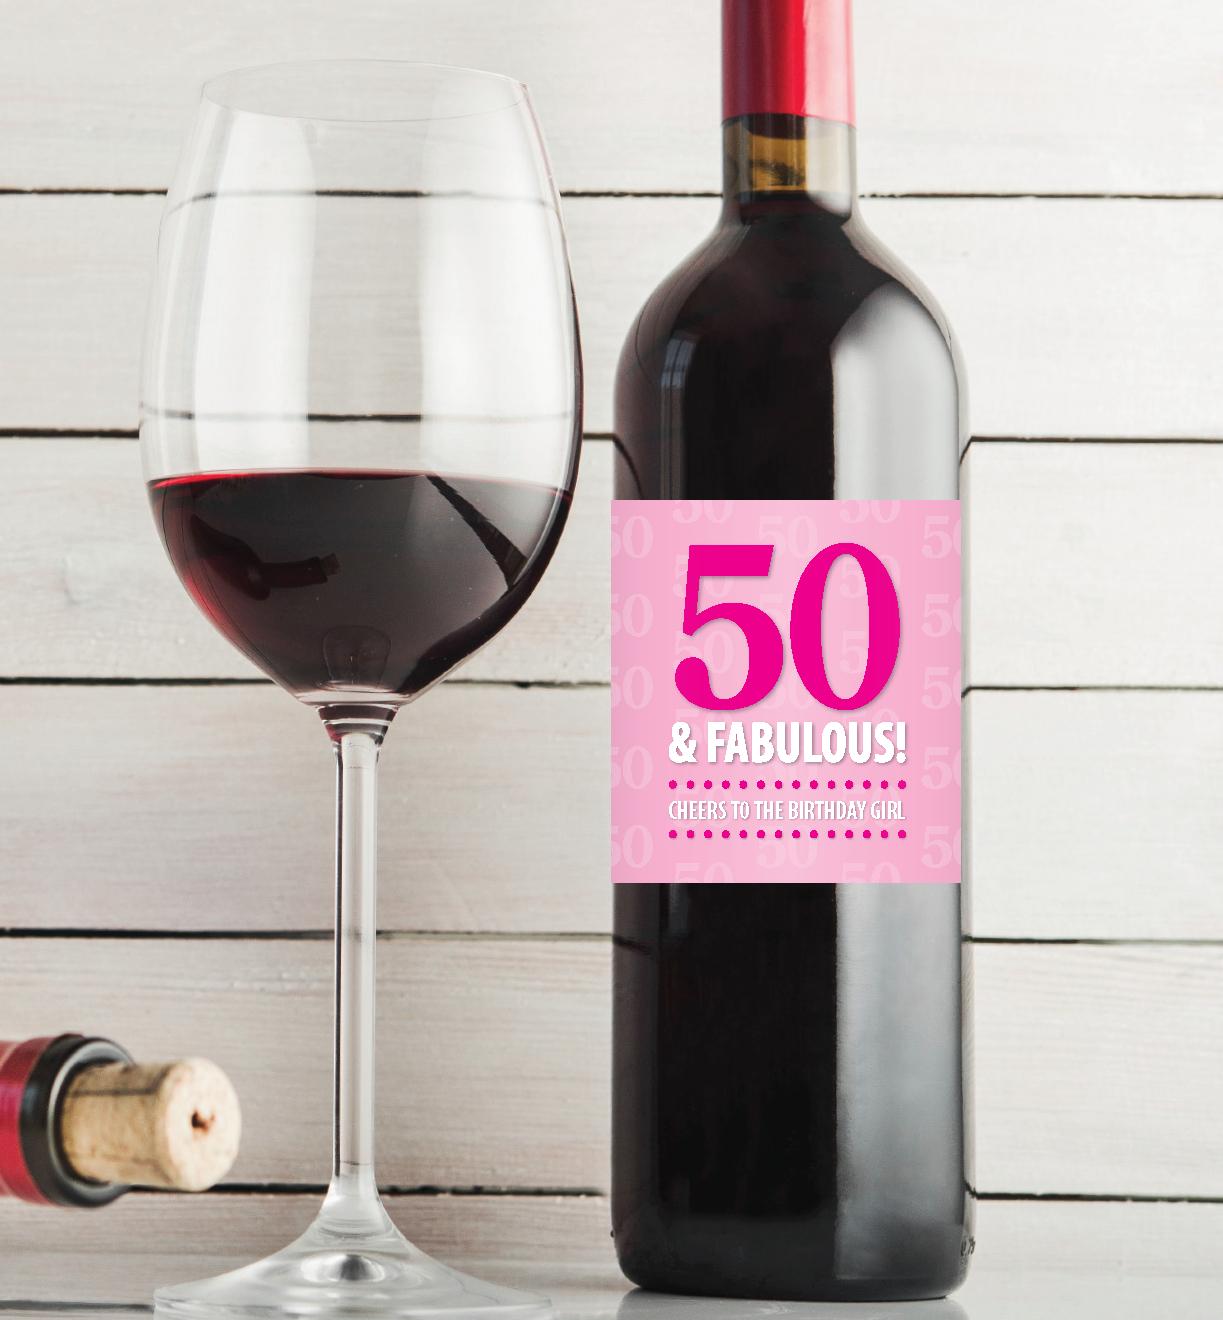 50 & Fabulous – 50Th Birthday Pdf Printable Wine Label Download In - Free Printable Birthday Wine Labels